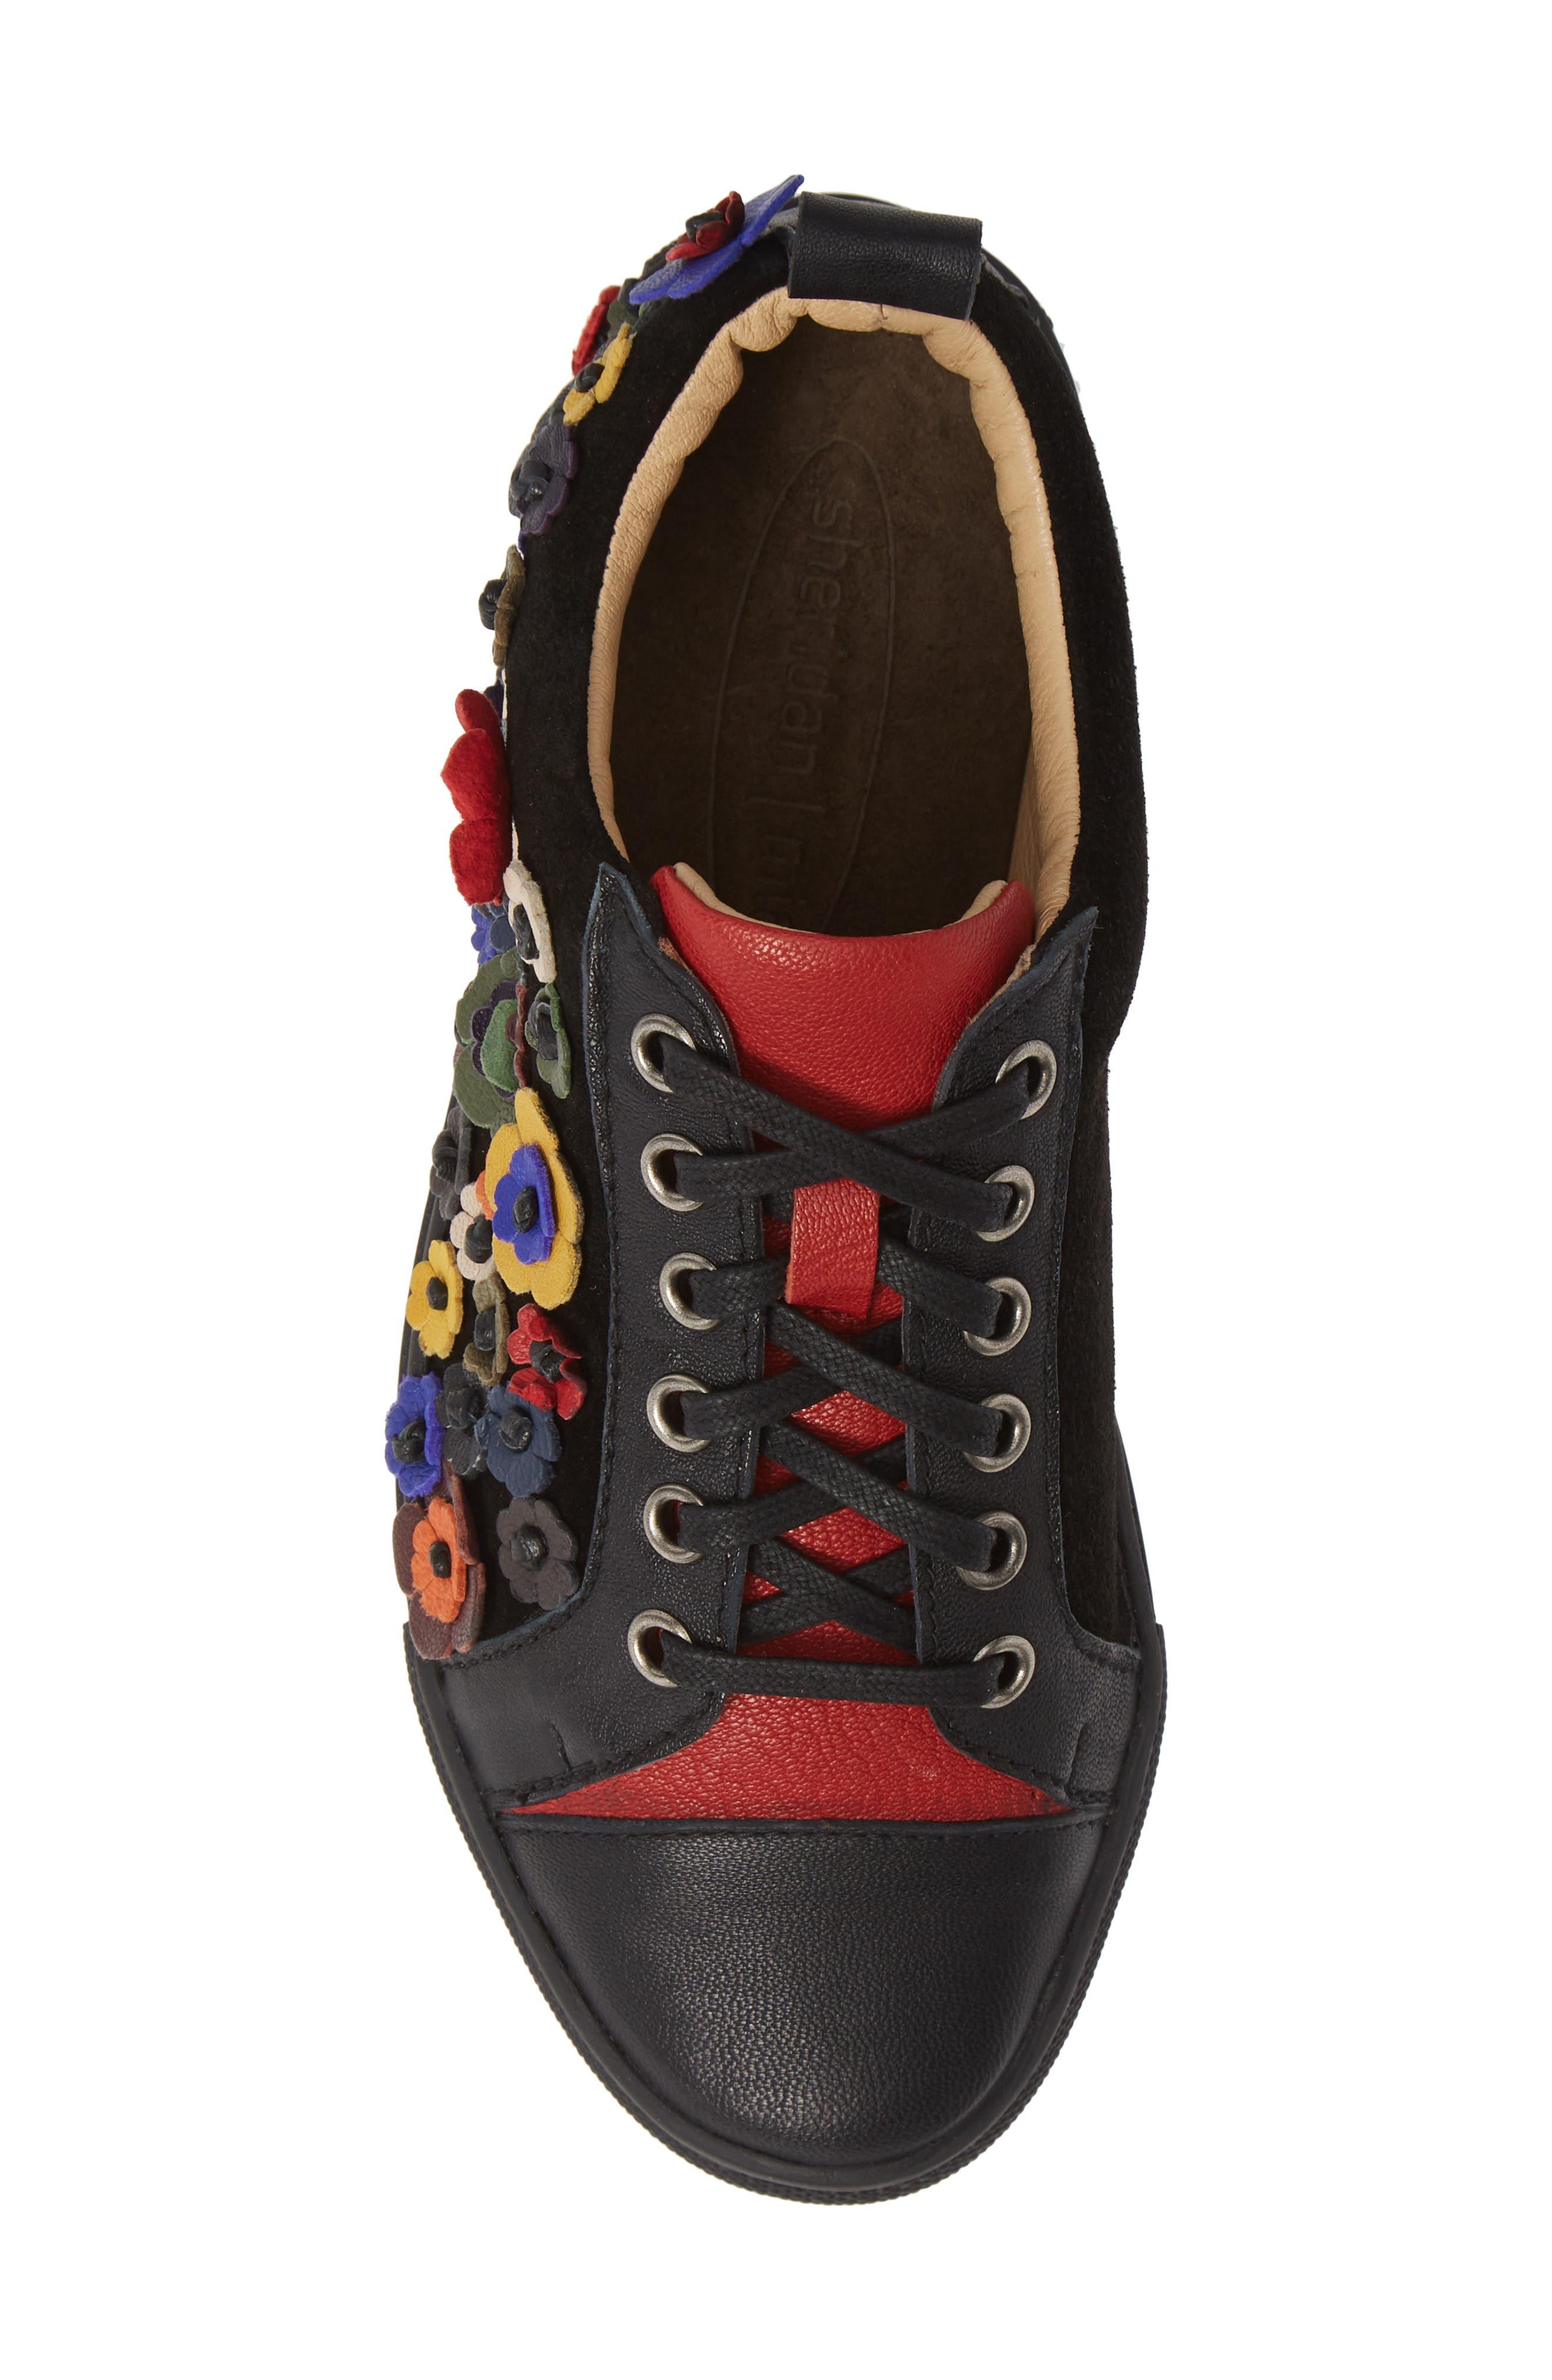 SHERIDAN MIA, Satyr Sneaker, Alternate thumbnail 5, color, BLACK LEATHER